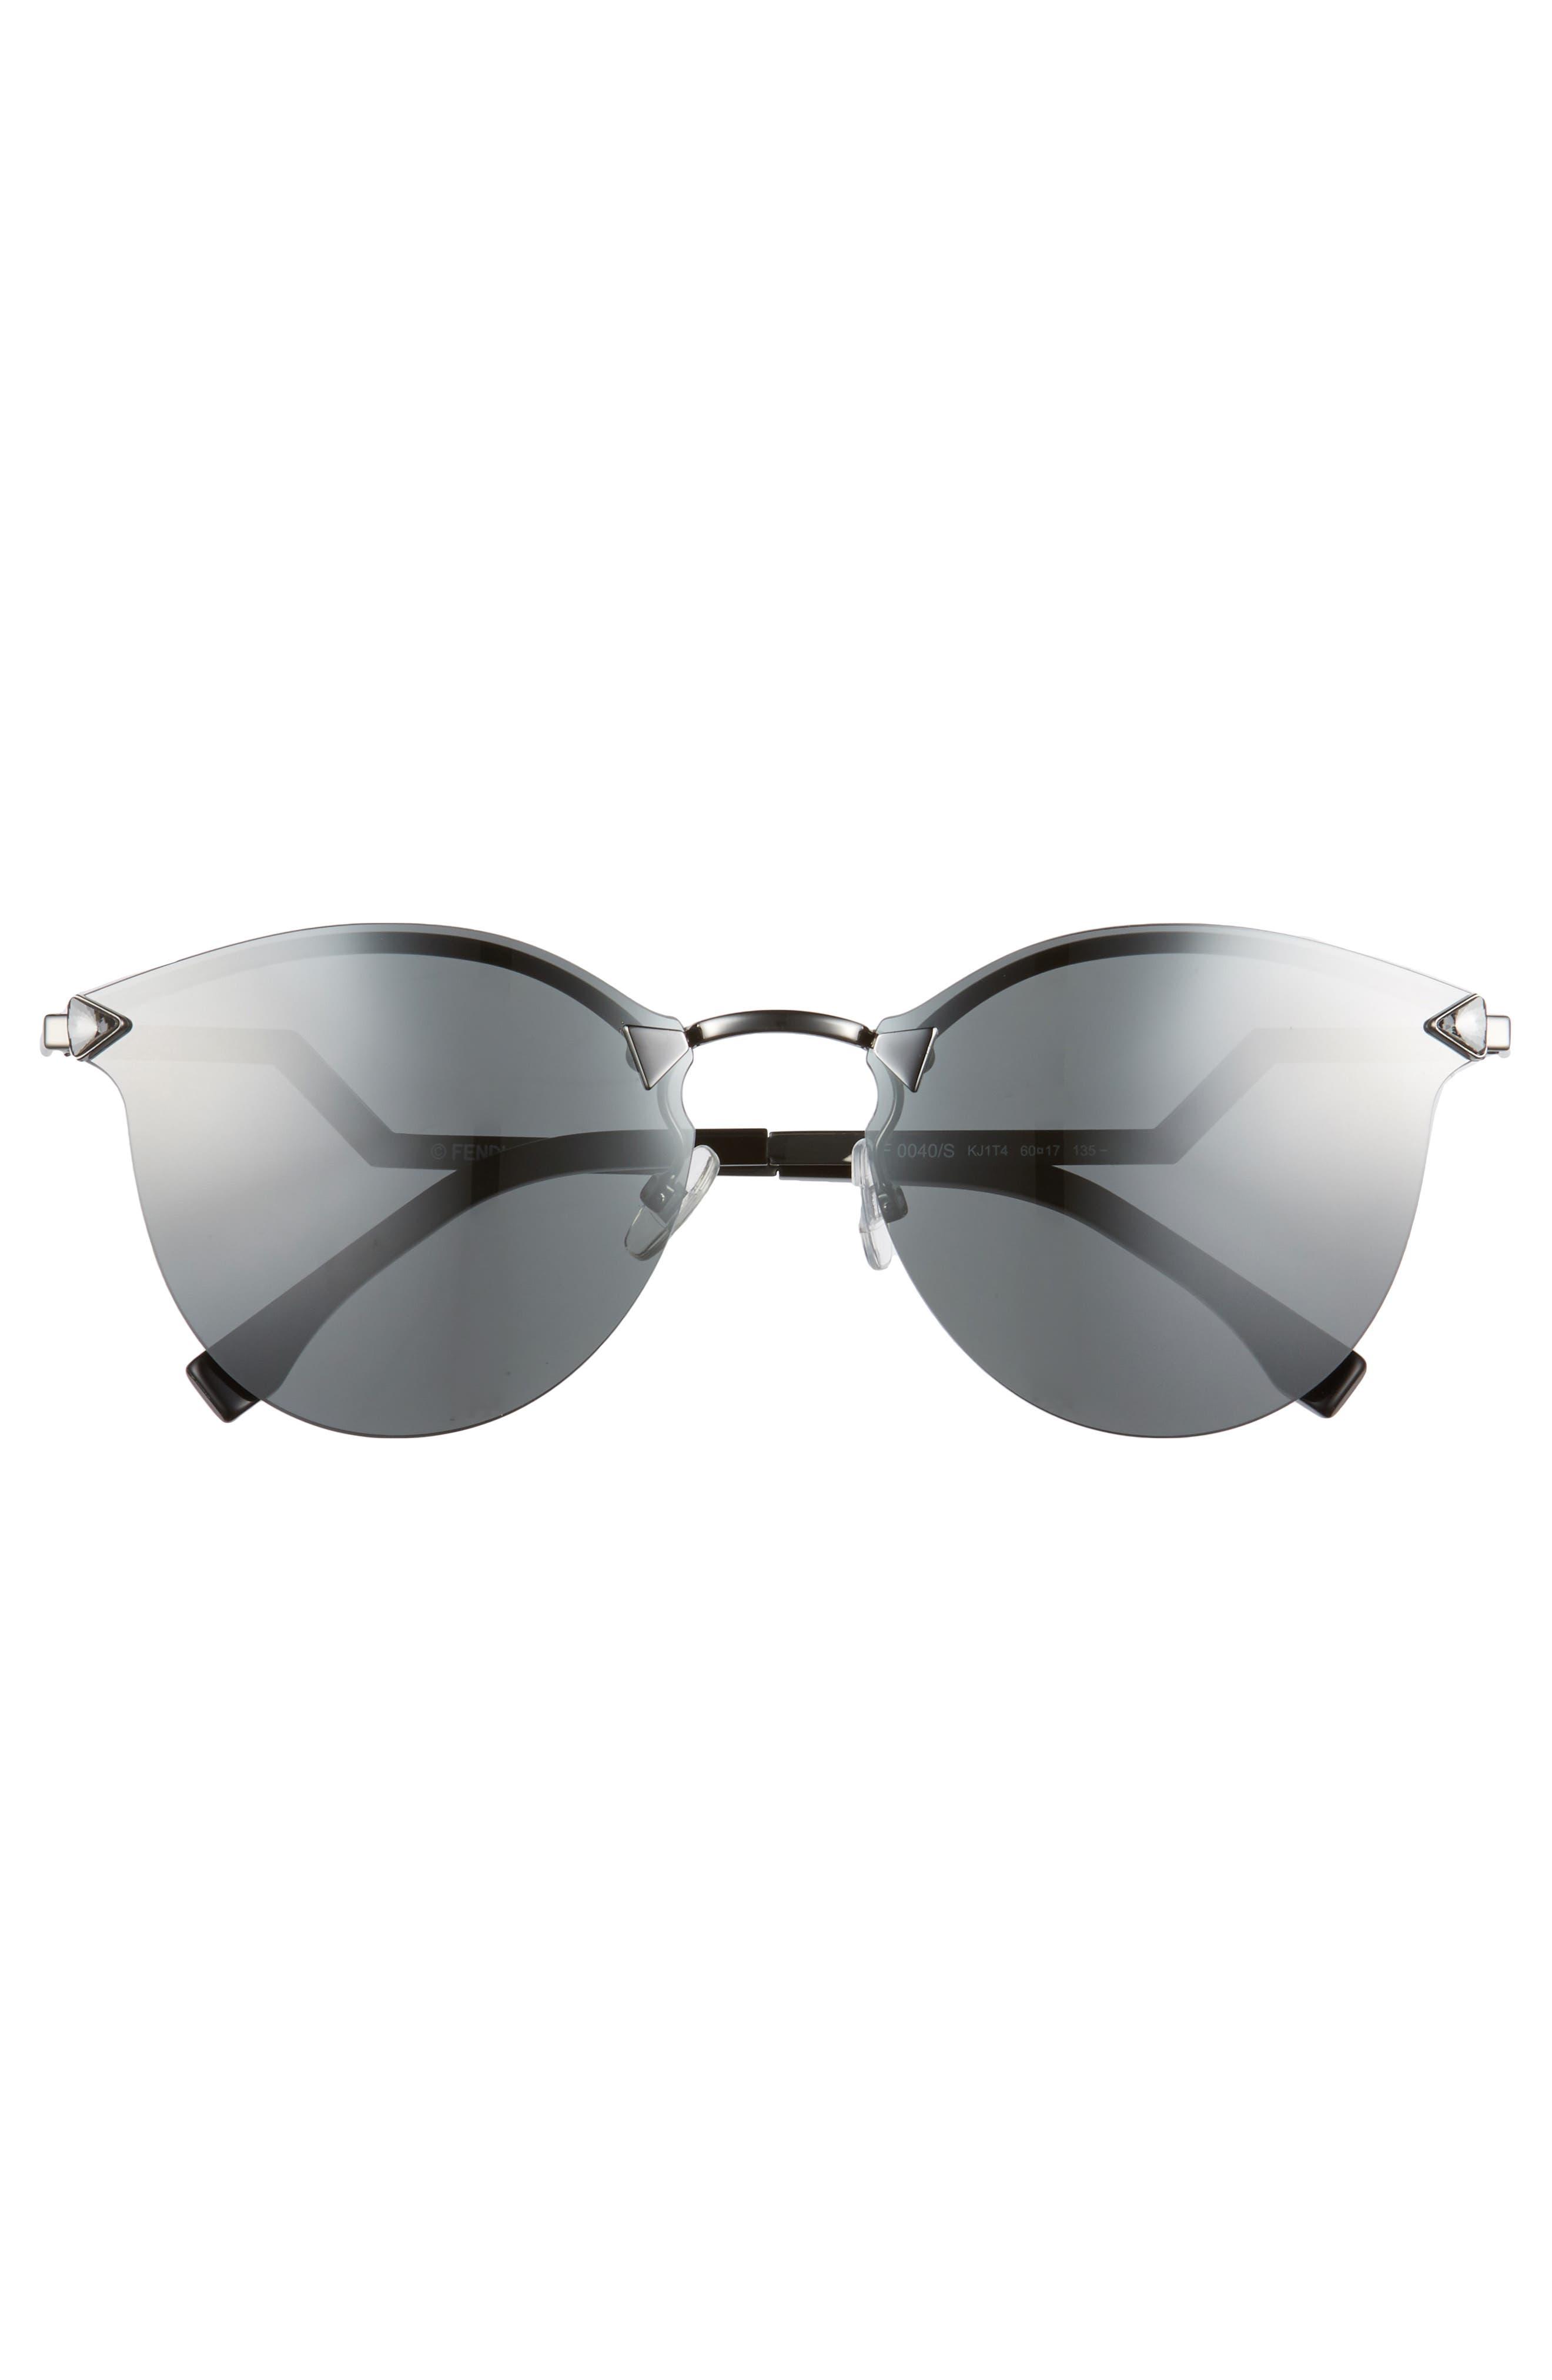 60mm Retro Sunglasses,                             Alternate thumbnail 3, color,                             045